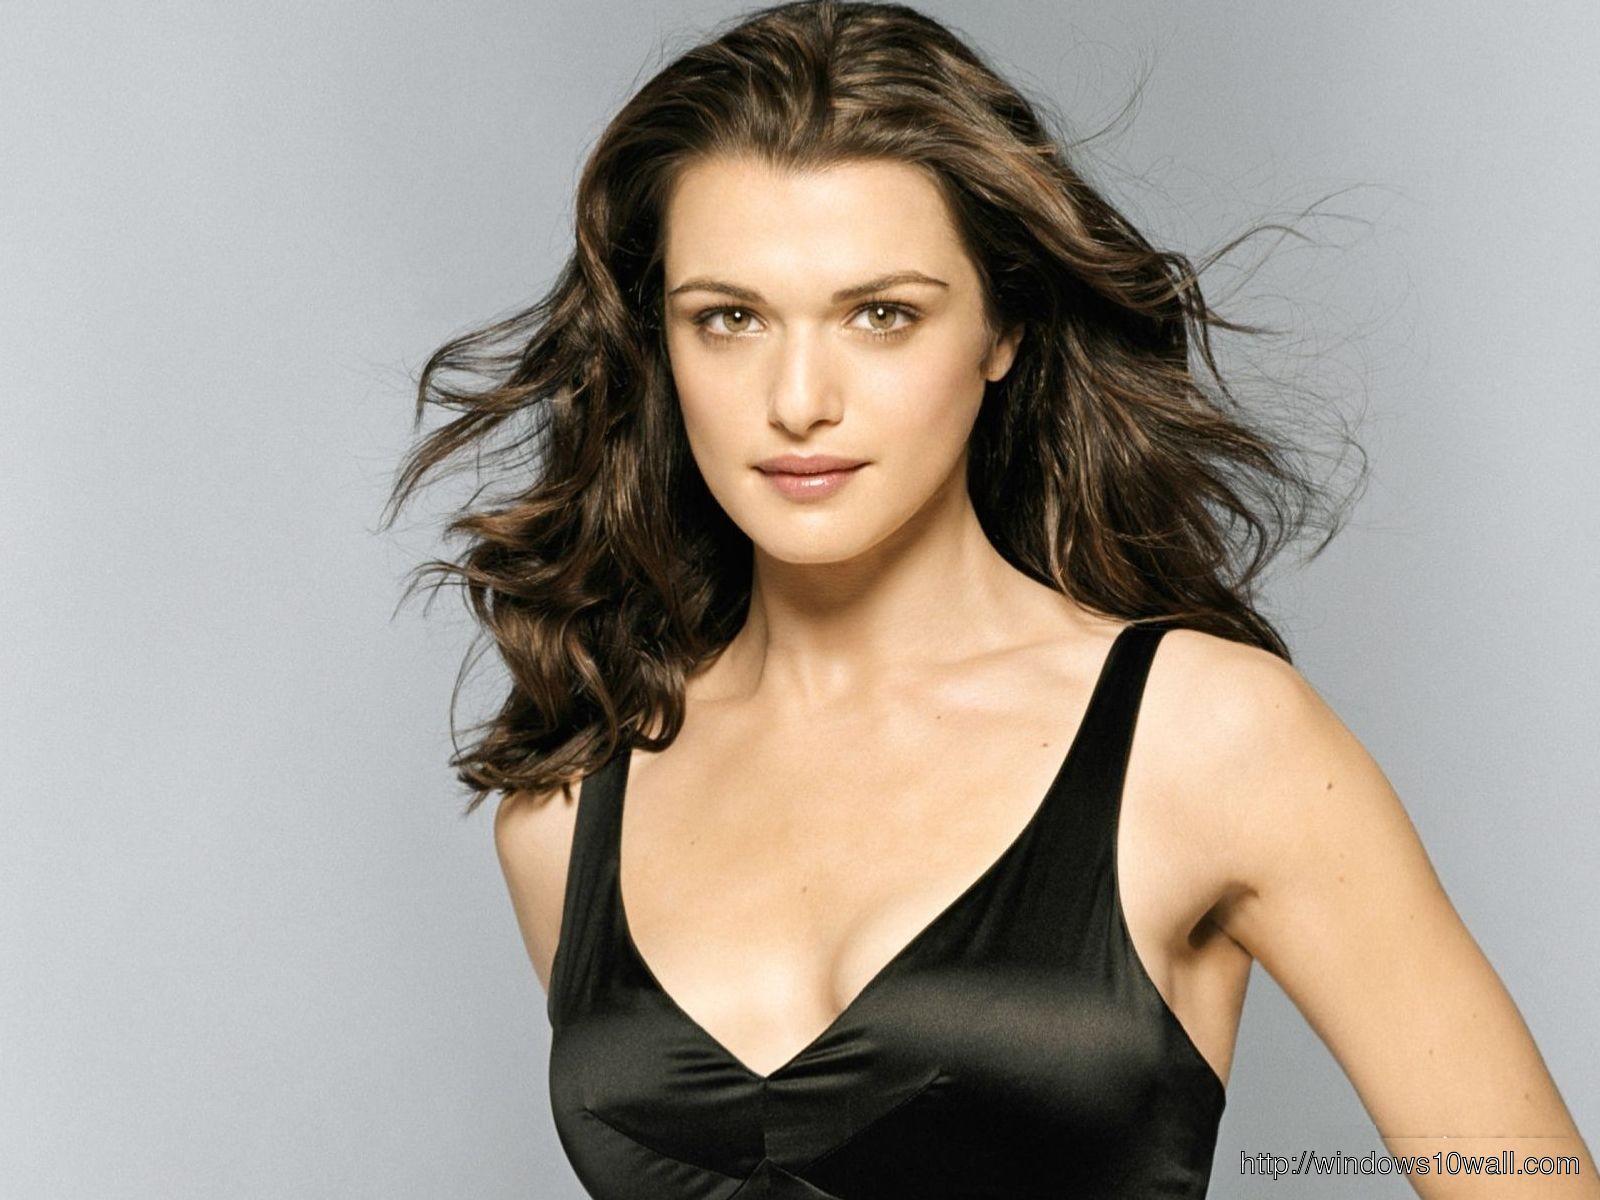 Rachel Weisz in Hot Black Dress Wallpaper